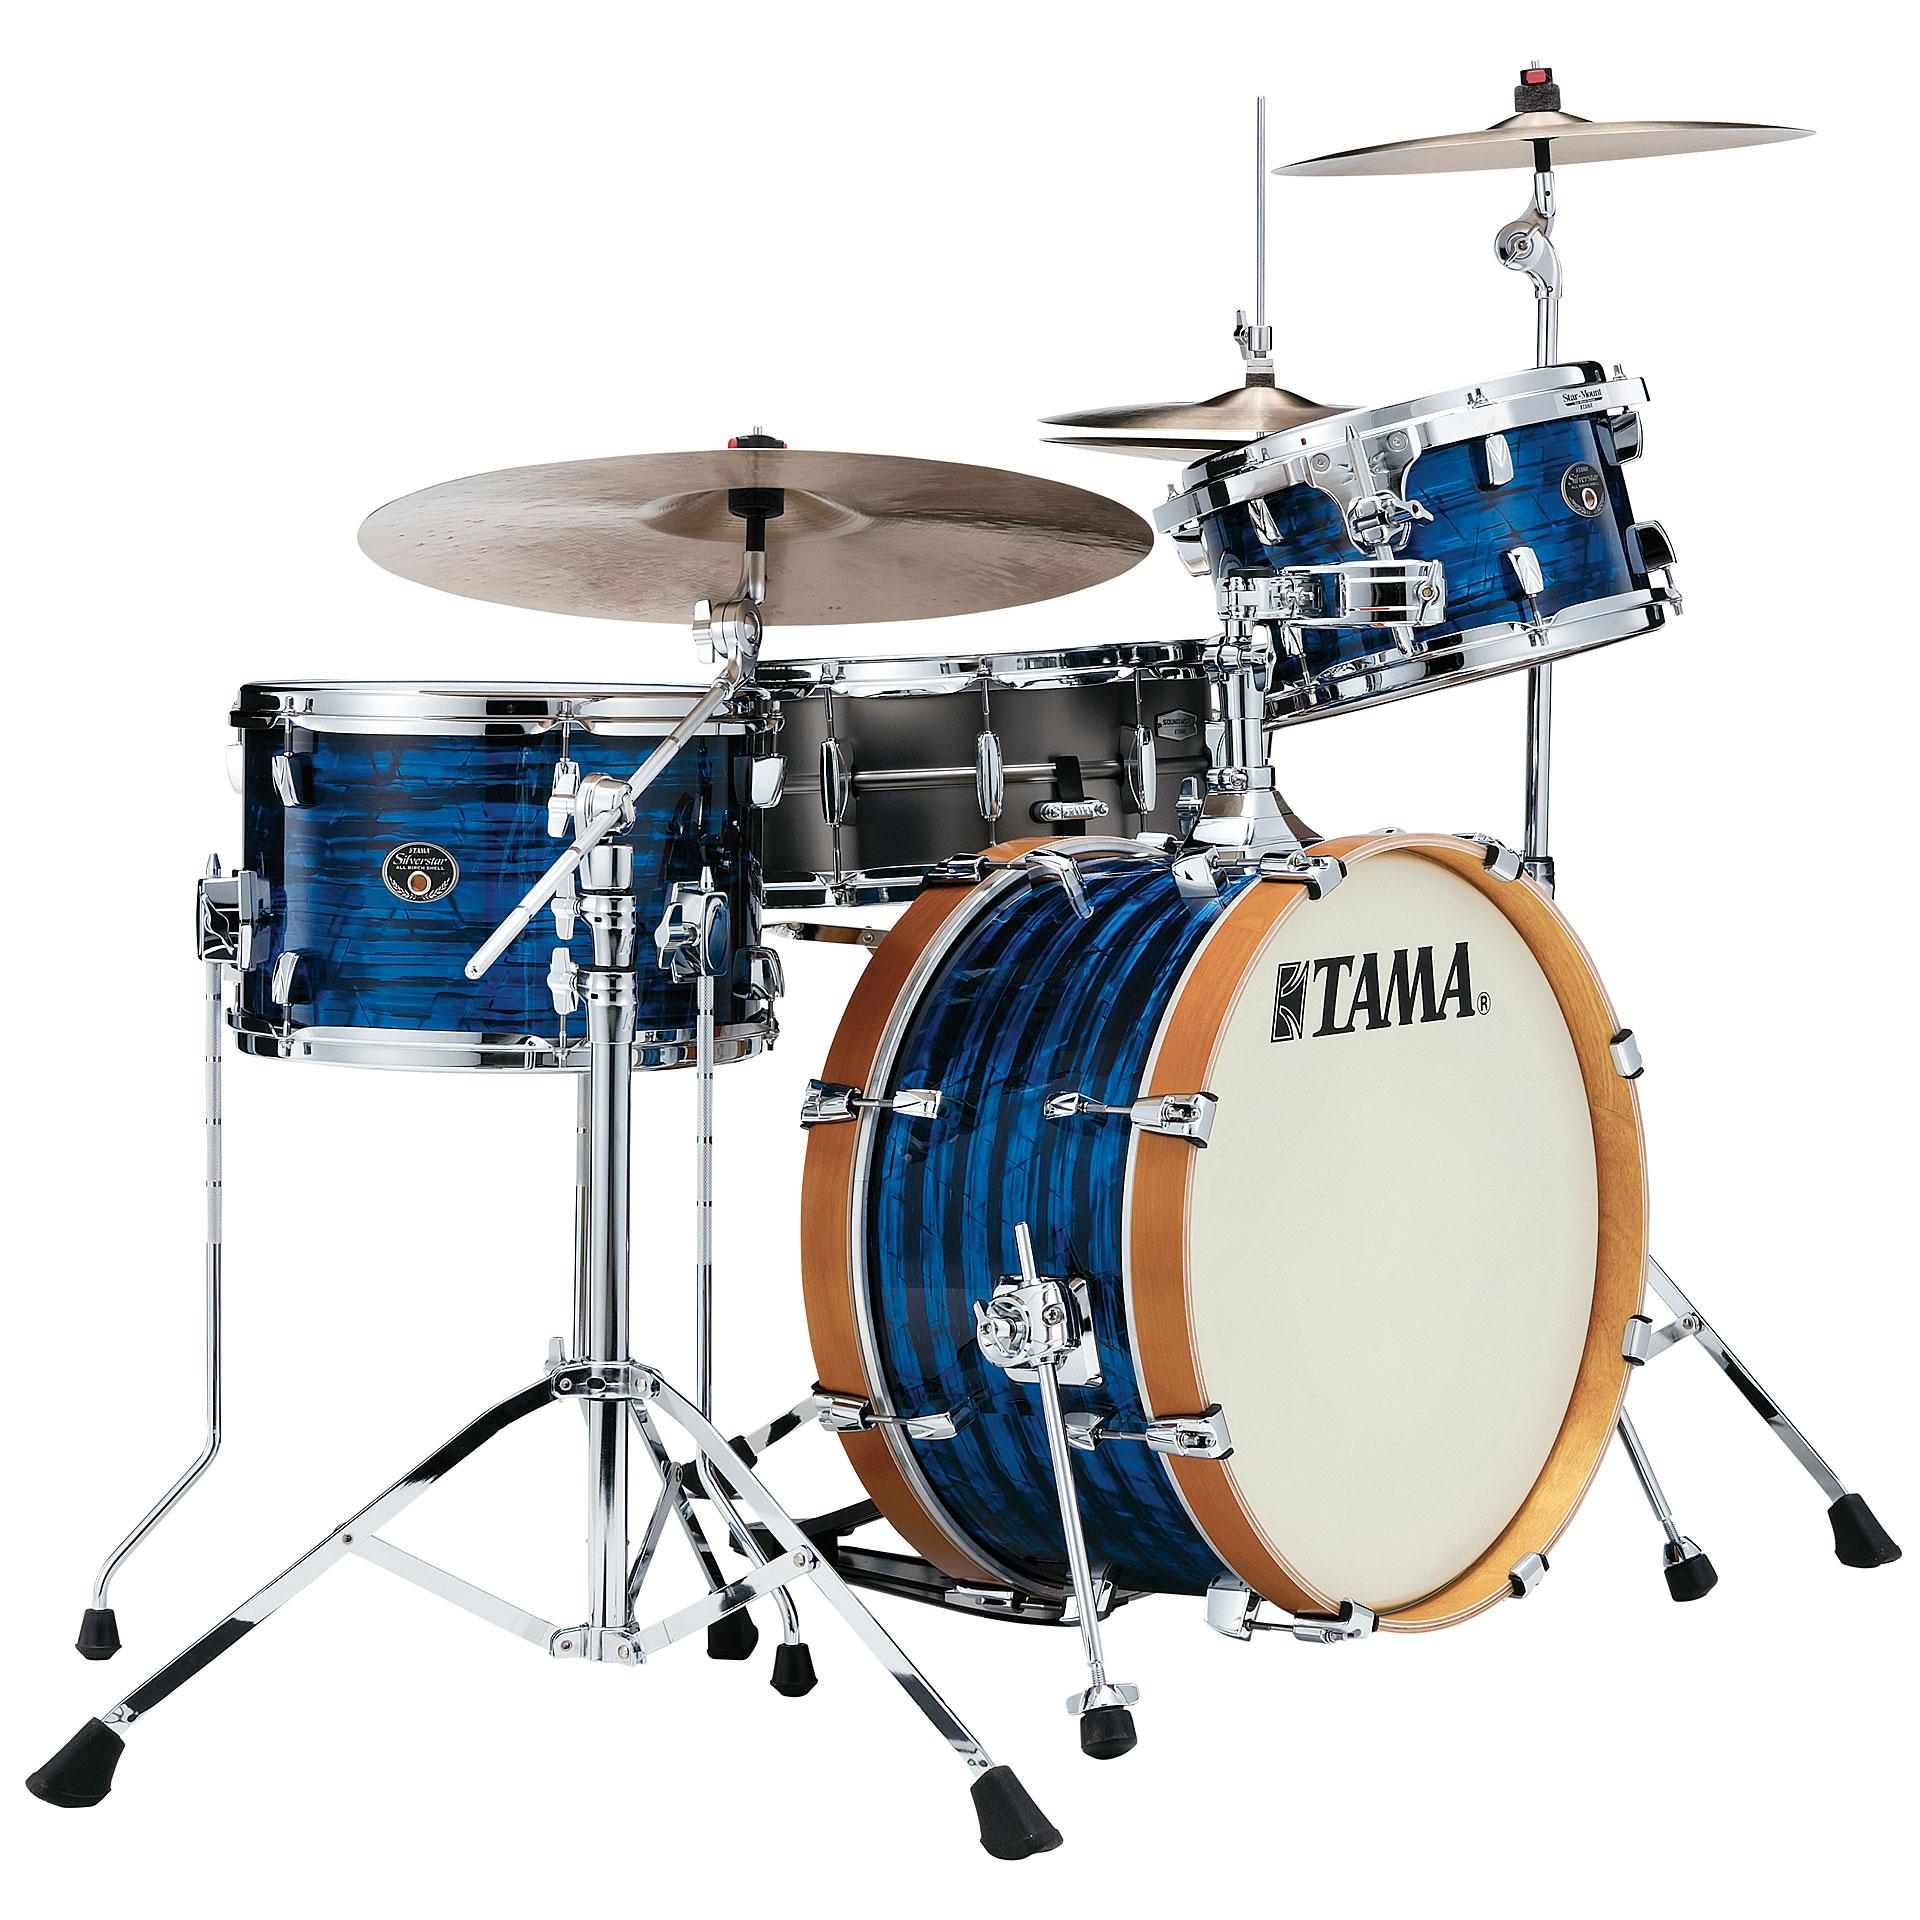 Tama silverstar blue onyx vintage shellset drum kit for Classic house drums